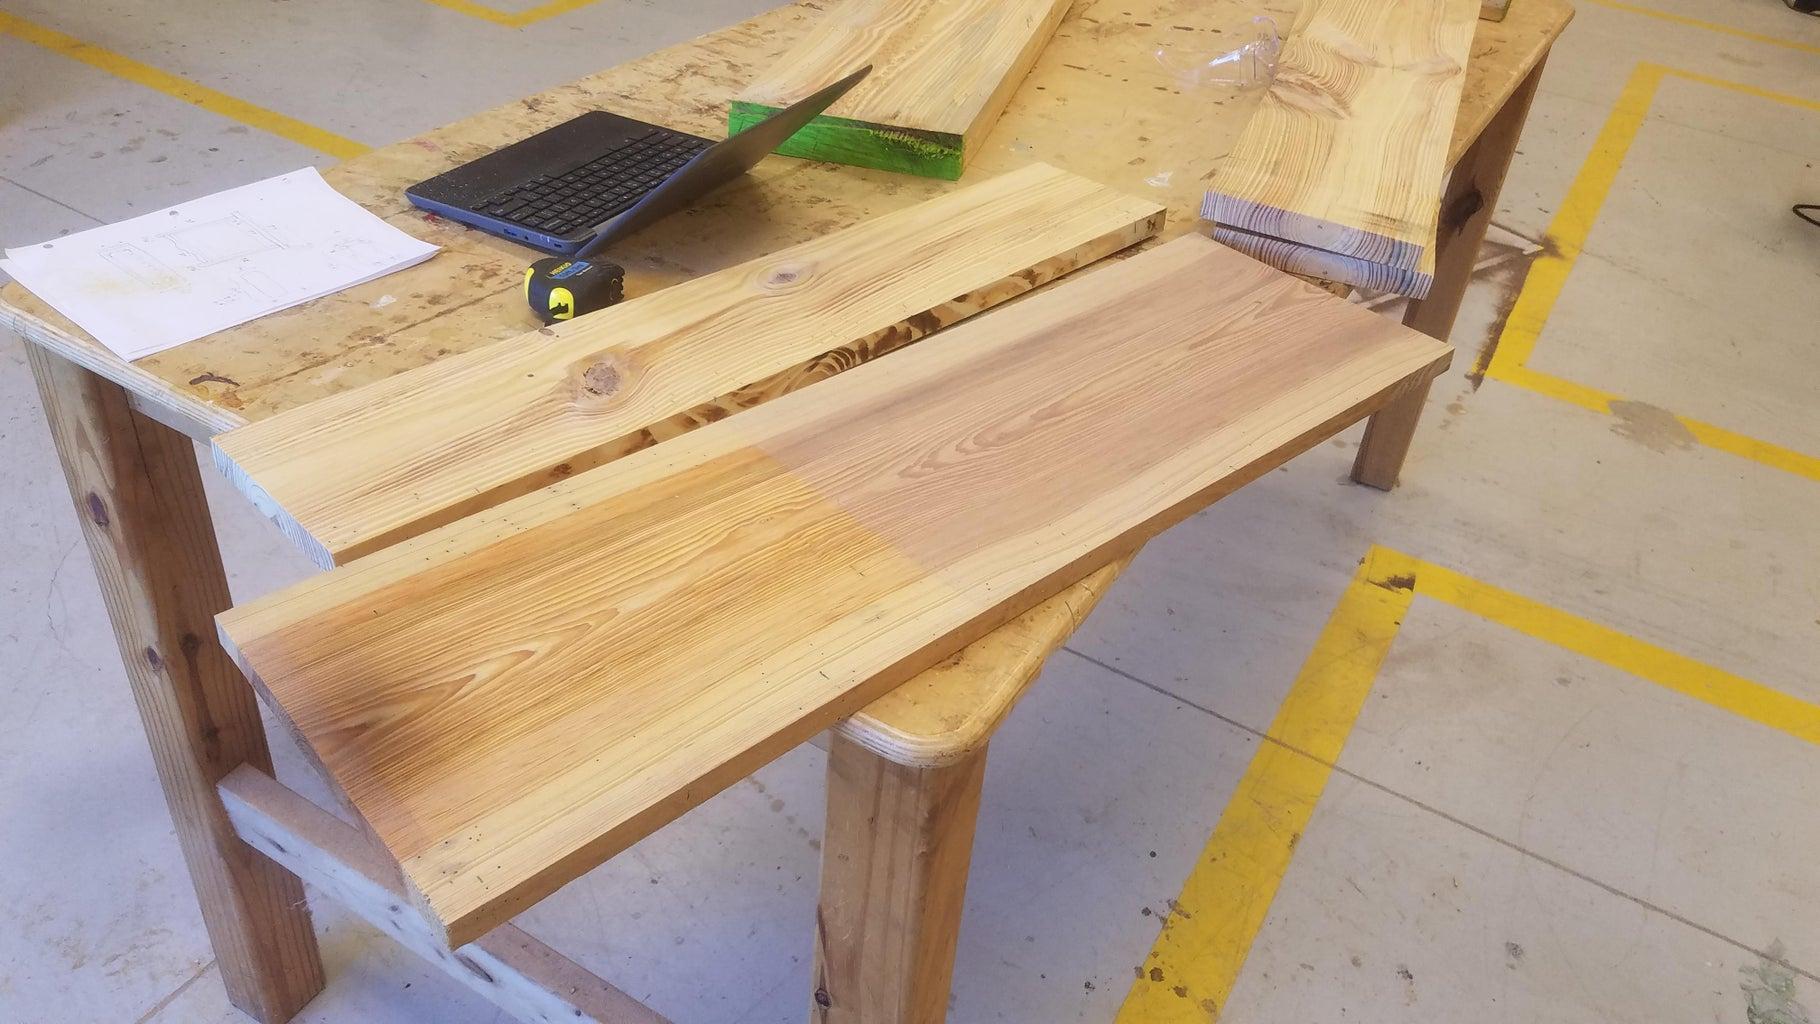 The Tabletop and Bottom Shelf